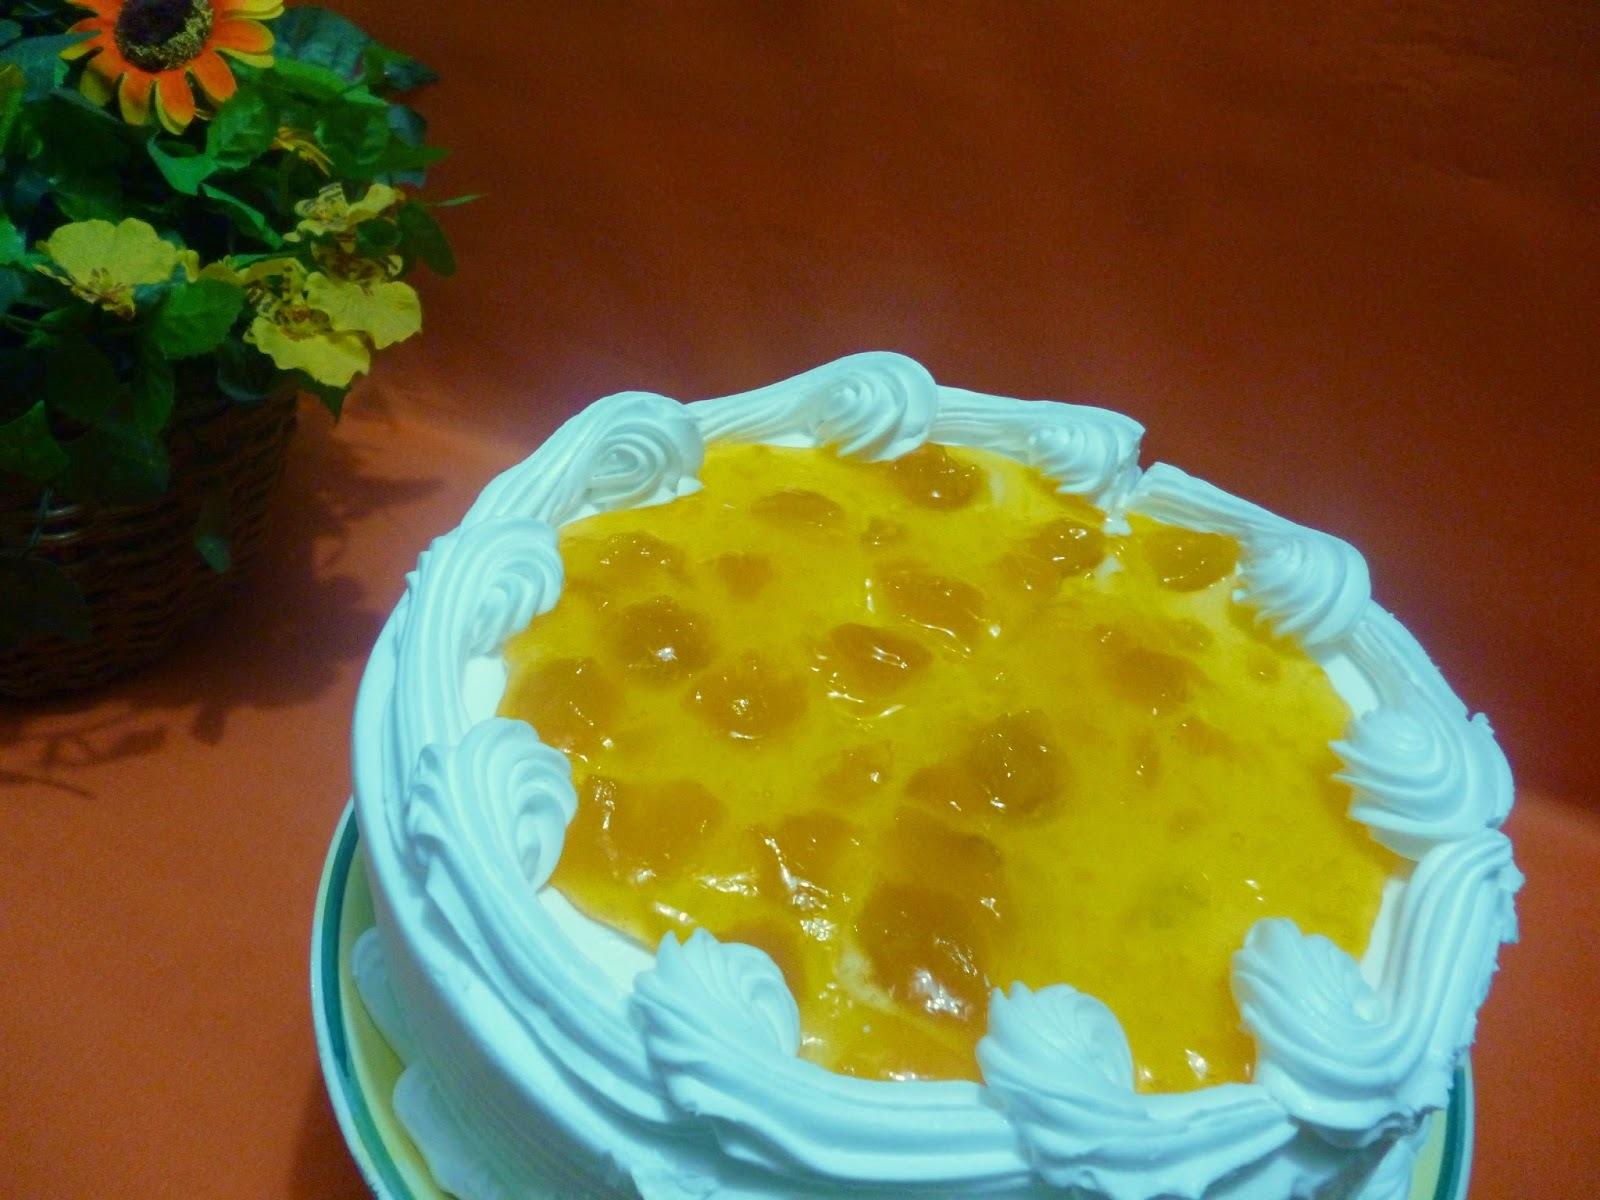 Torta de naranja y melocotones